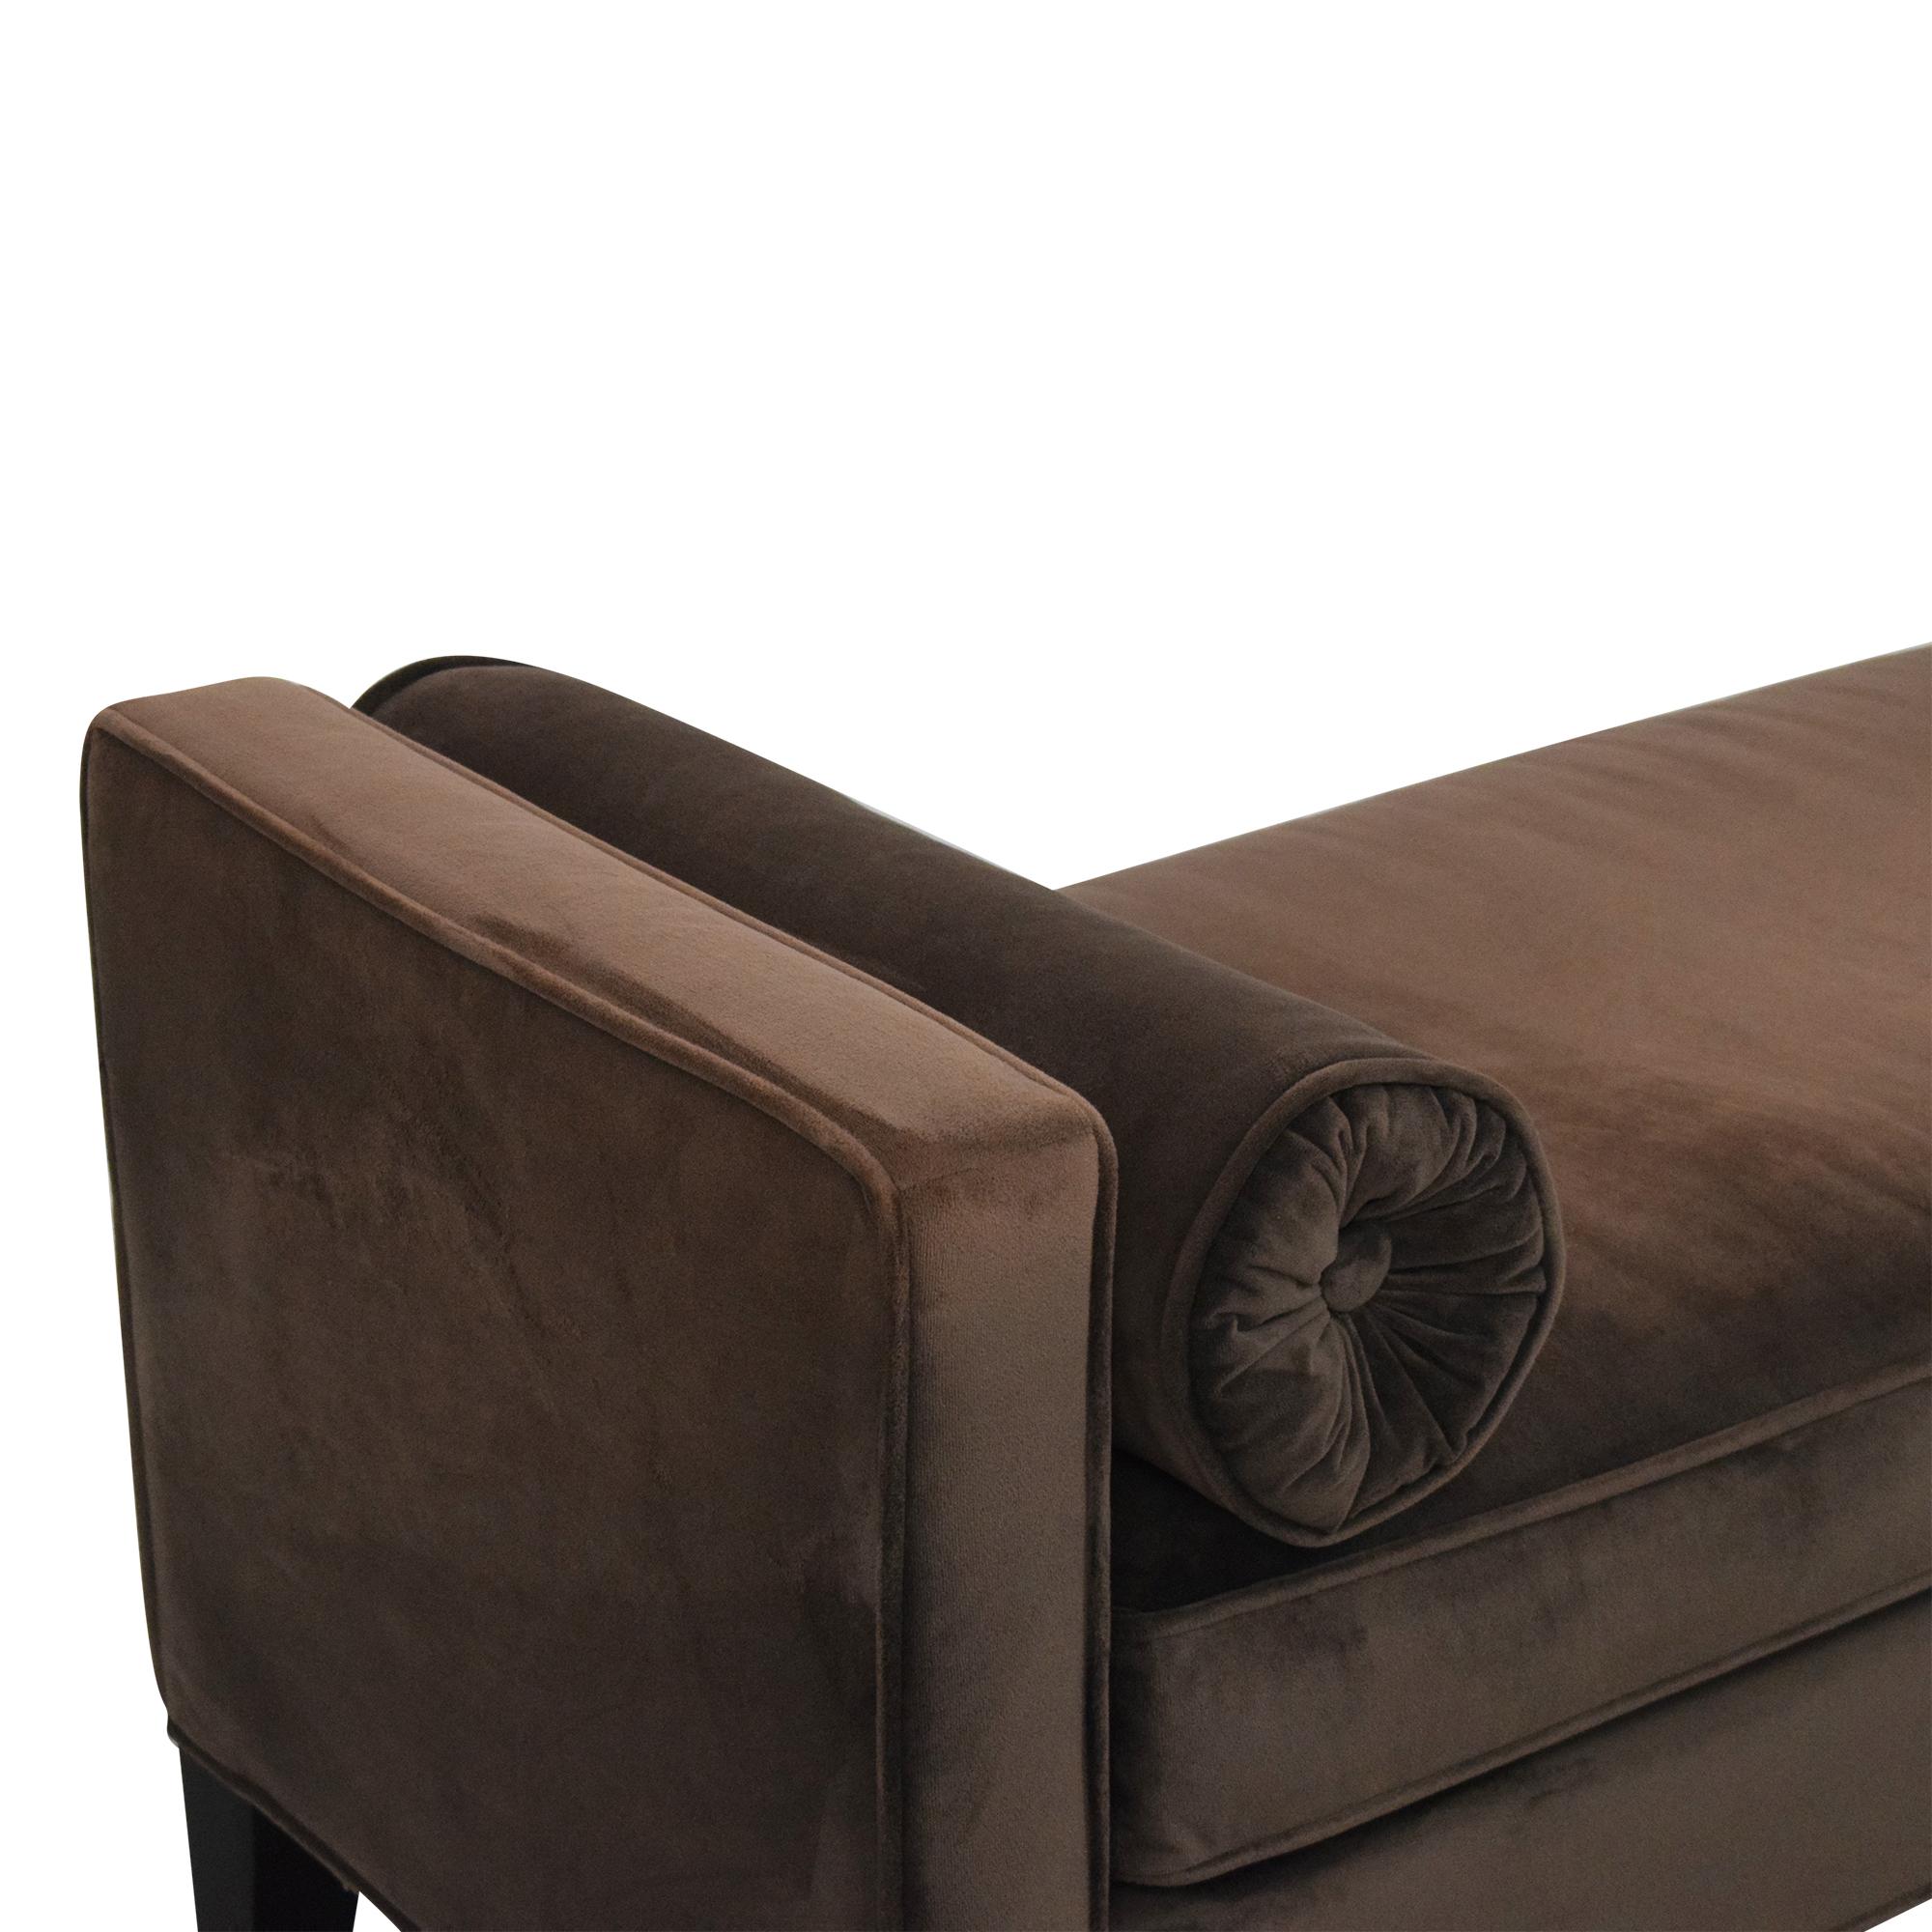 Mitchell Gold + Bob Williams Mitchell Gold + Bob Williams Upholstered Bench nj